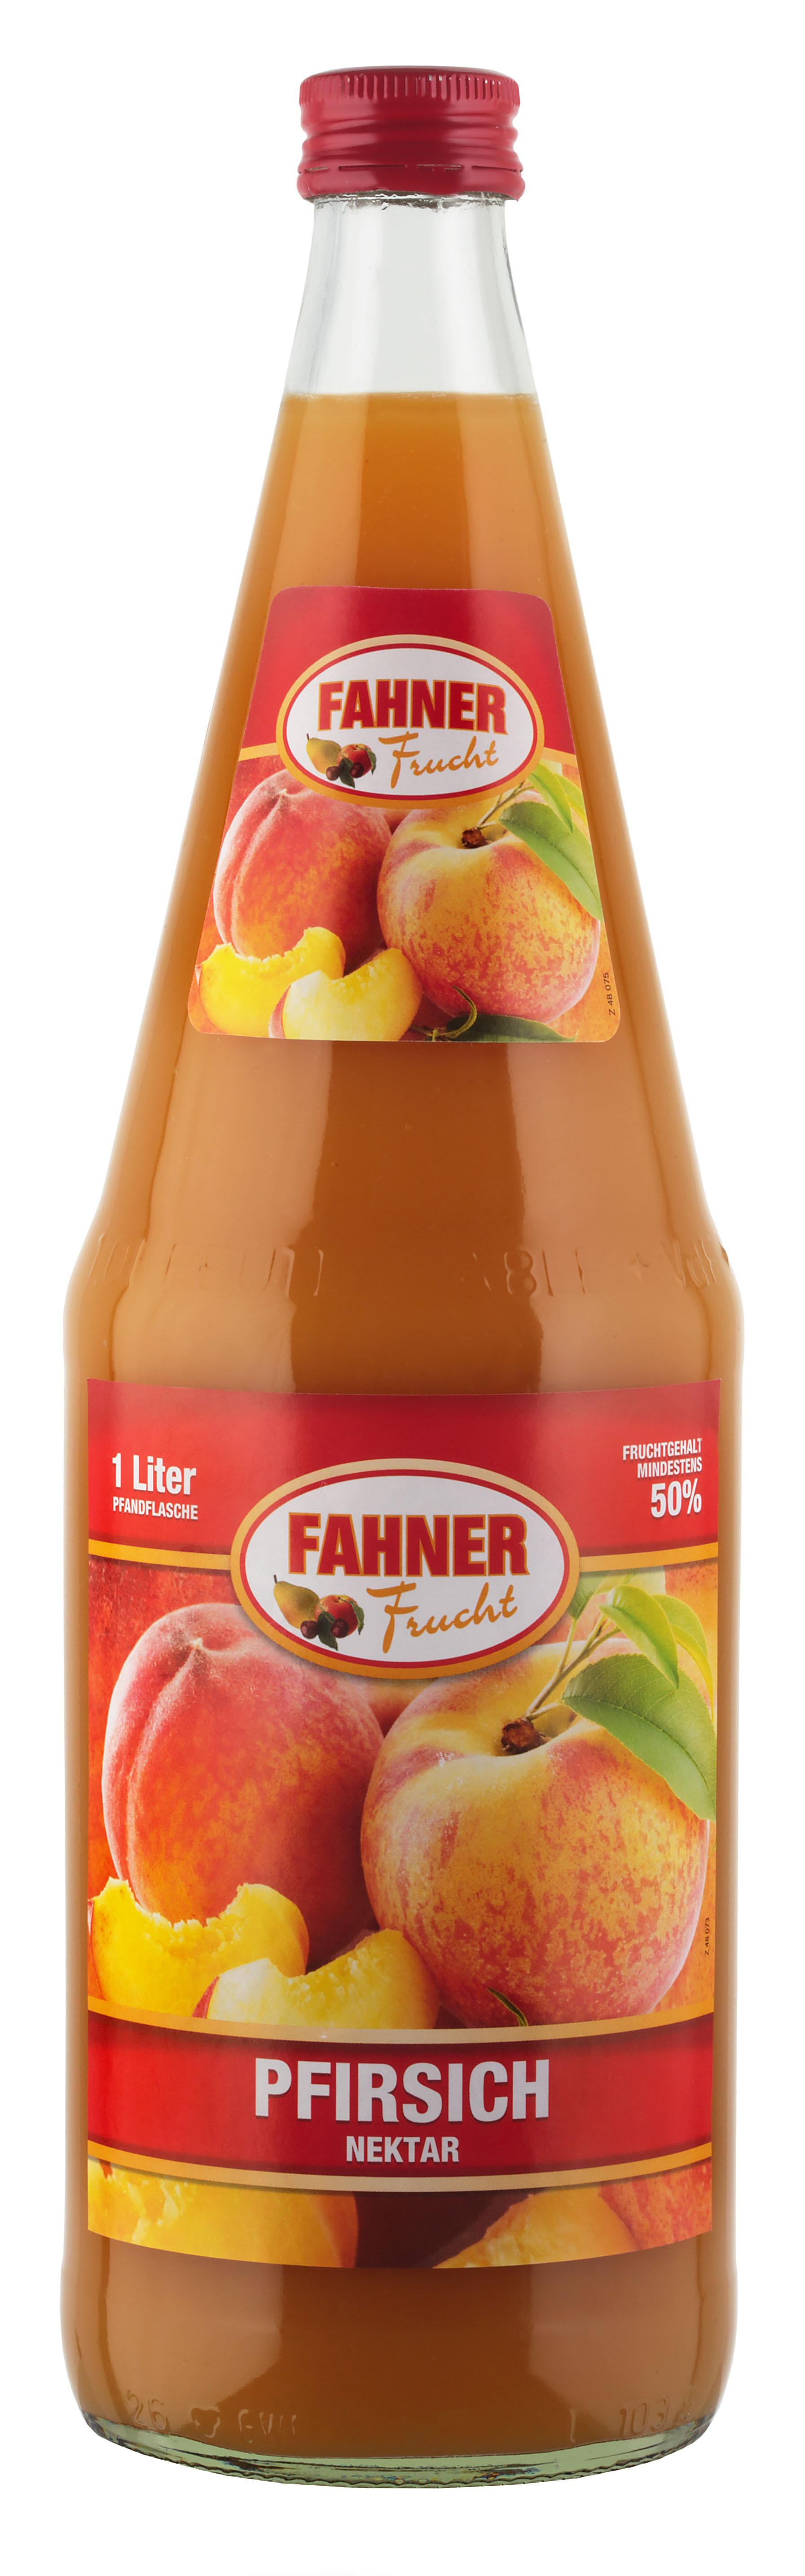 FAHNER Pfirsich Nektar 6x1 l